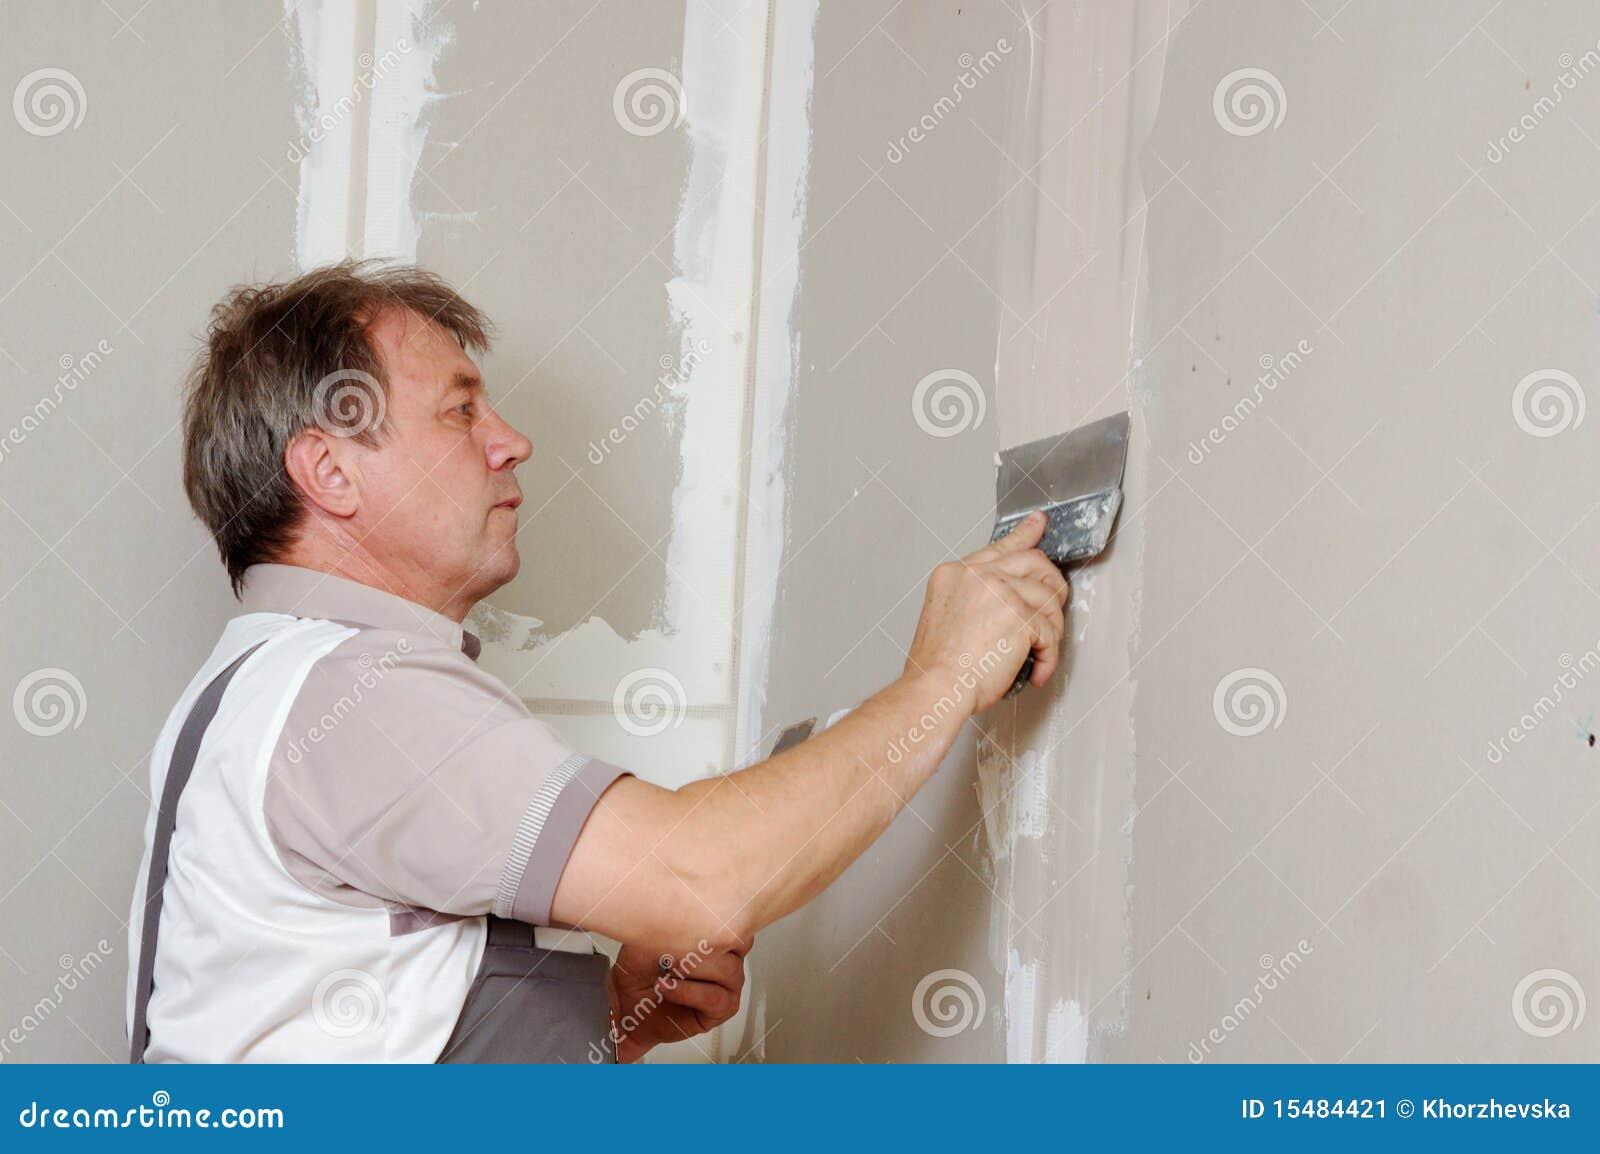 Plasterboard do Putty